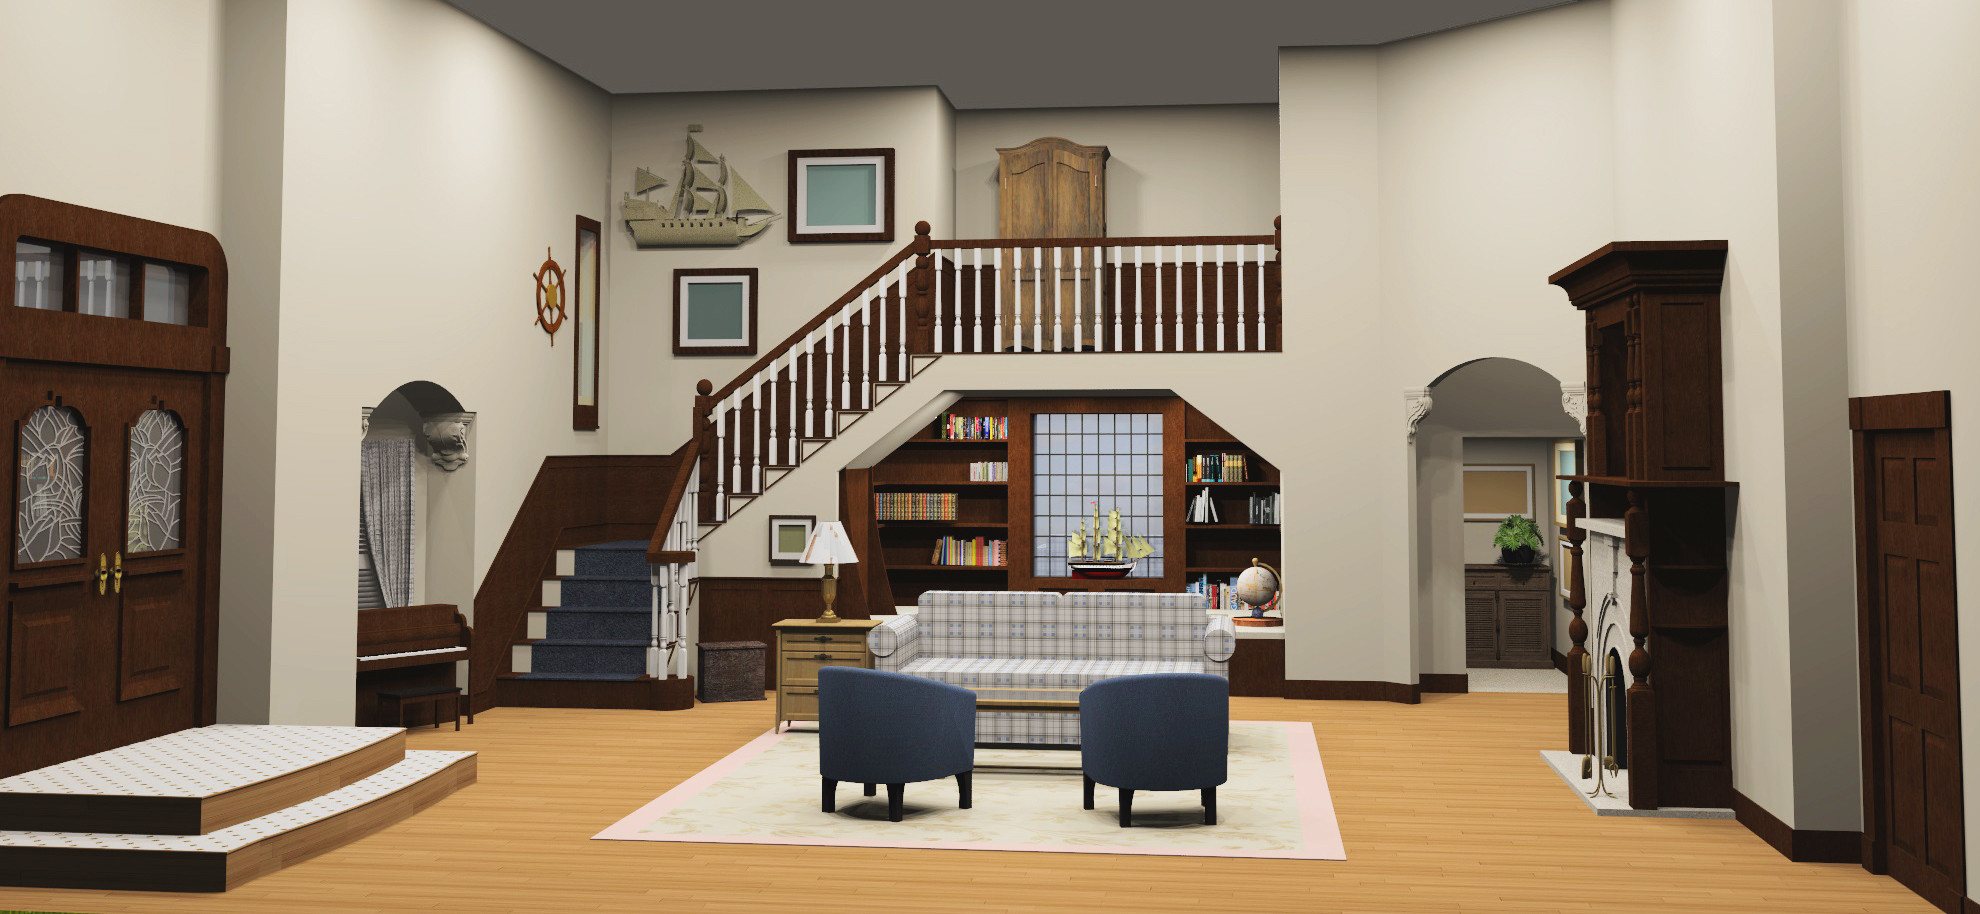 Full House Home Mockingbirdlane